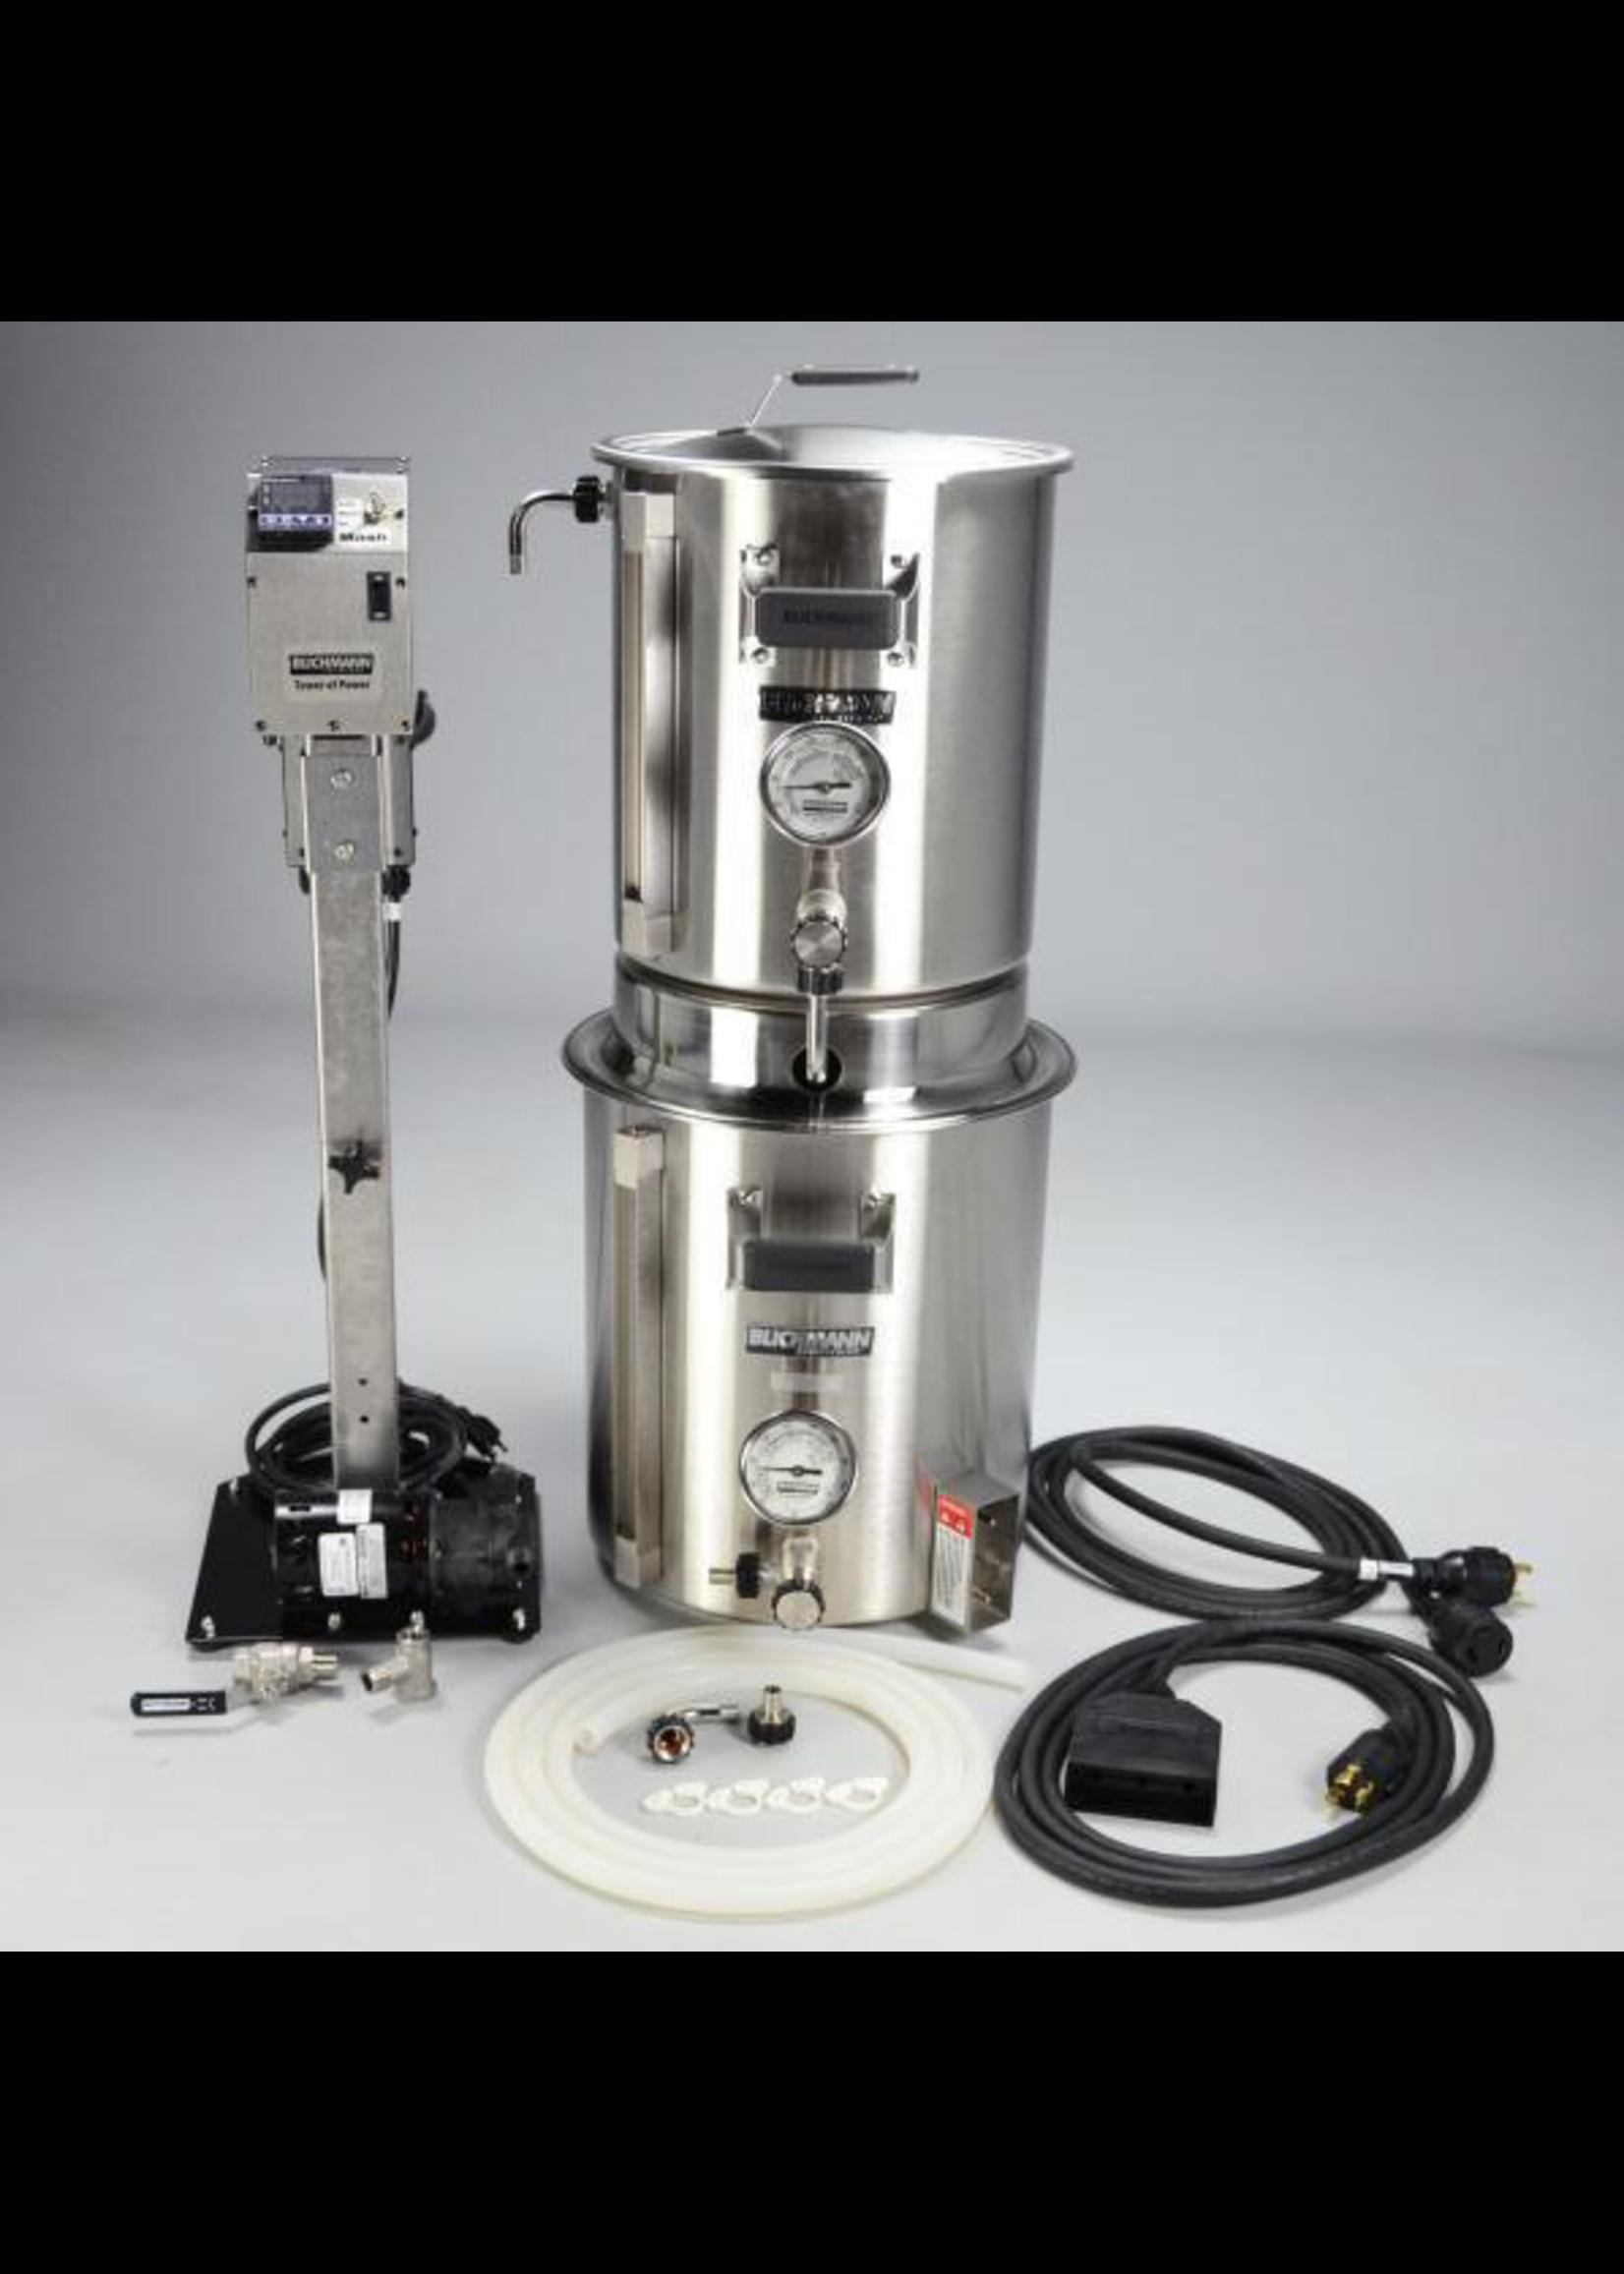 Blichmann Blichmann BrewEasy - Turnkey Kit - 120V FULL VERSION - 5 Gallon G2